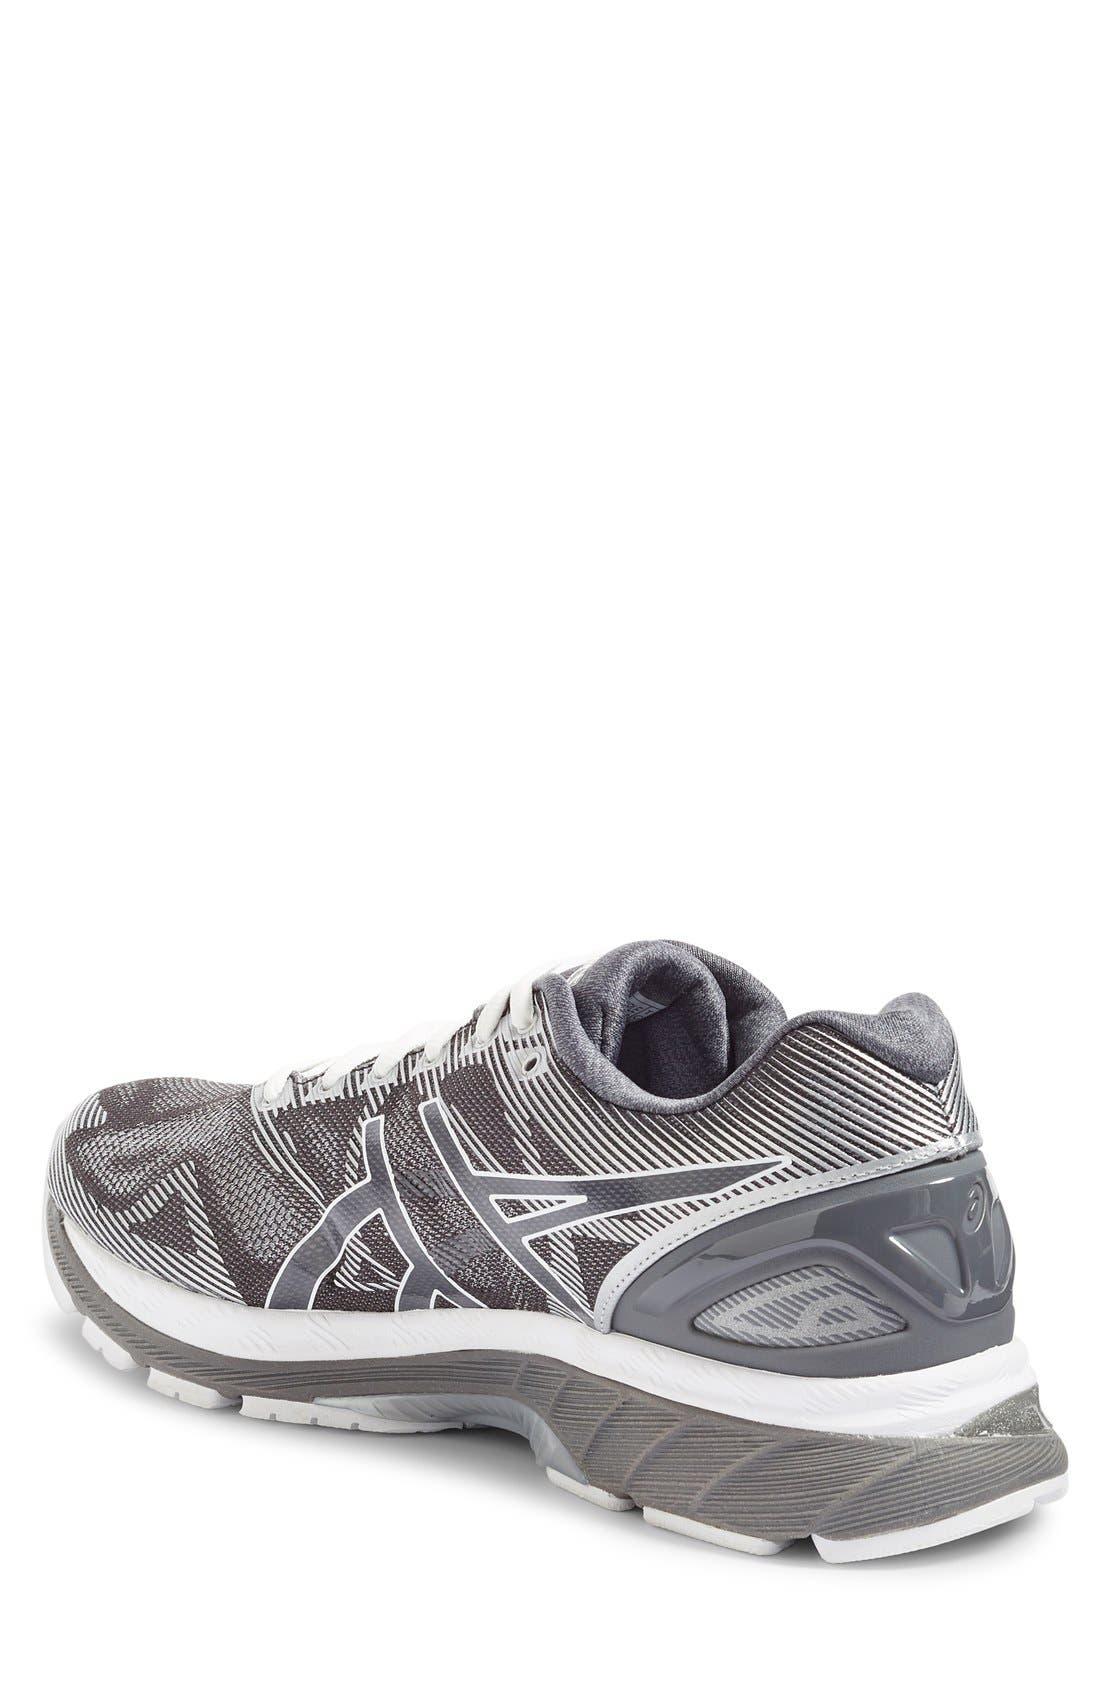 Alternate Image 2  - ASICS® GEL®-Nimbus 19 Running Shoe (Men)